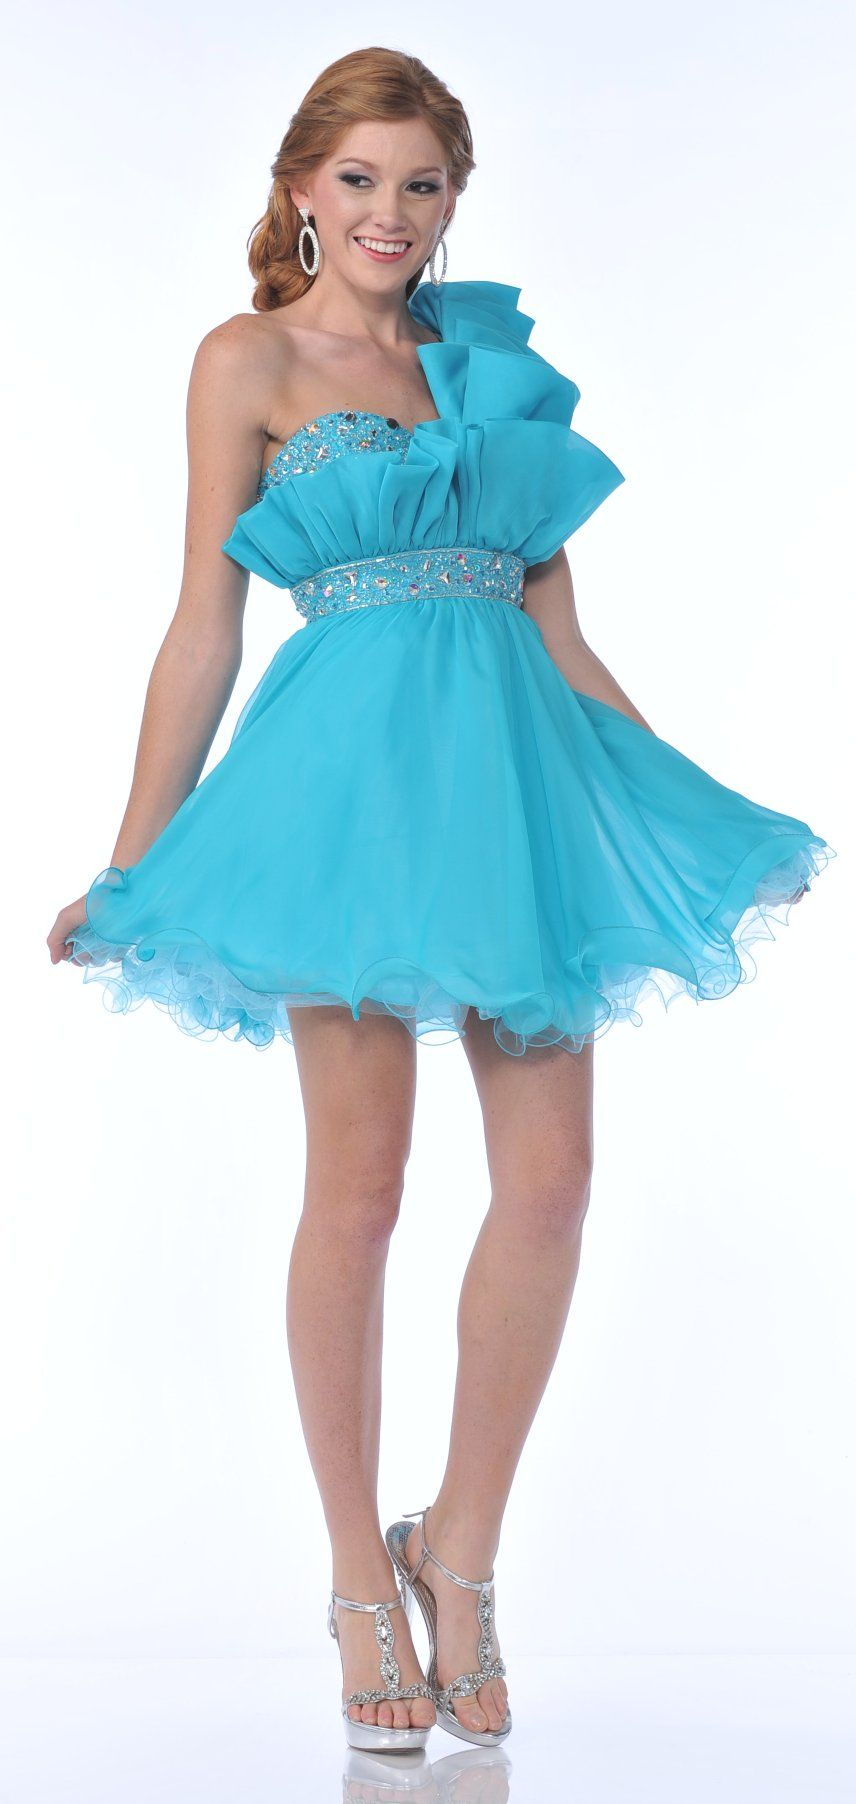 Crumbcatcher One Shoulder Strap Aqua Short Prom Dress Tulle Beads ...